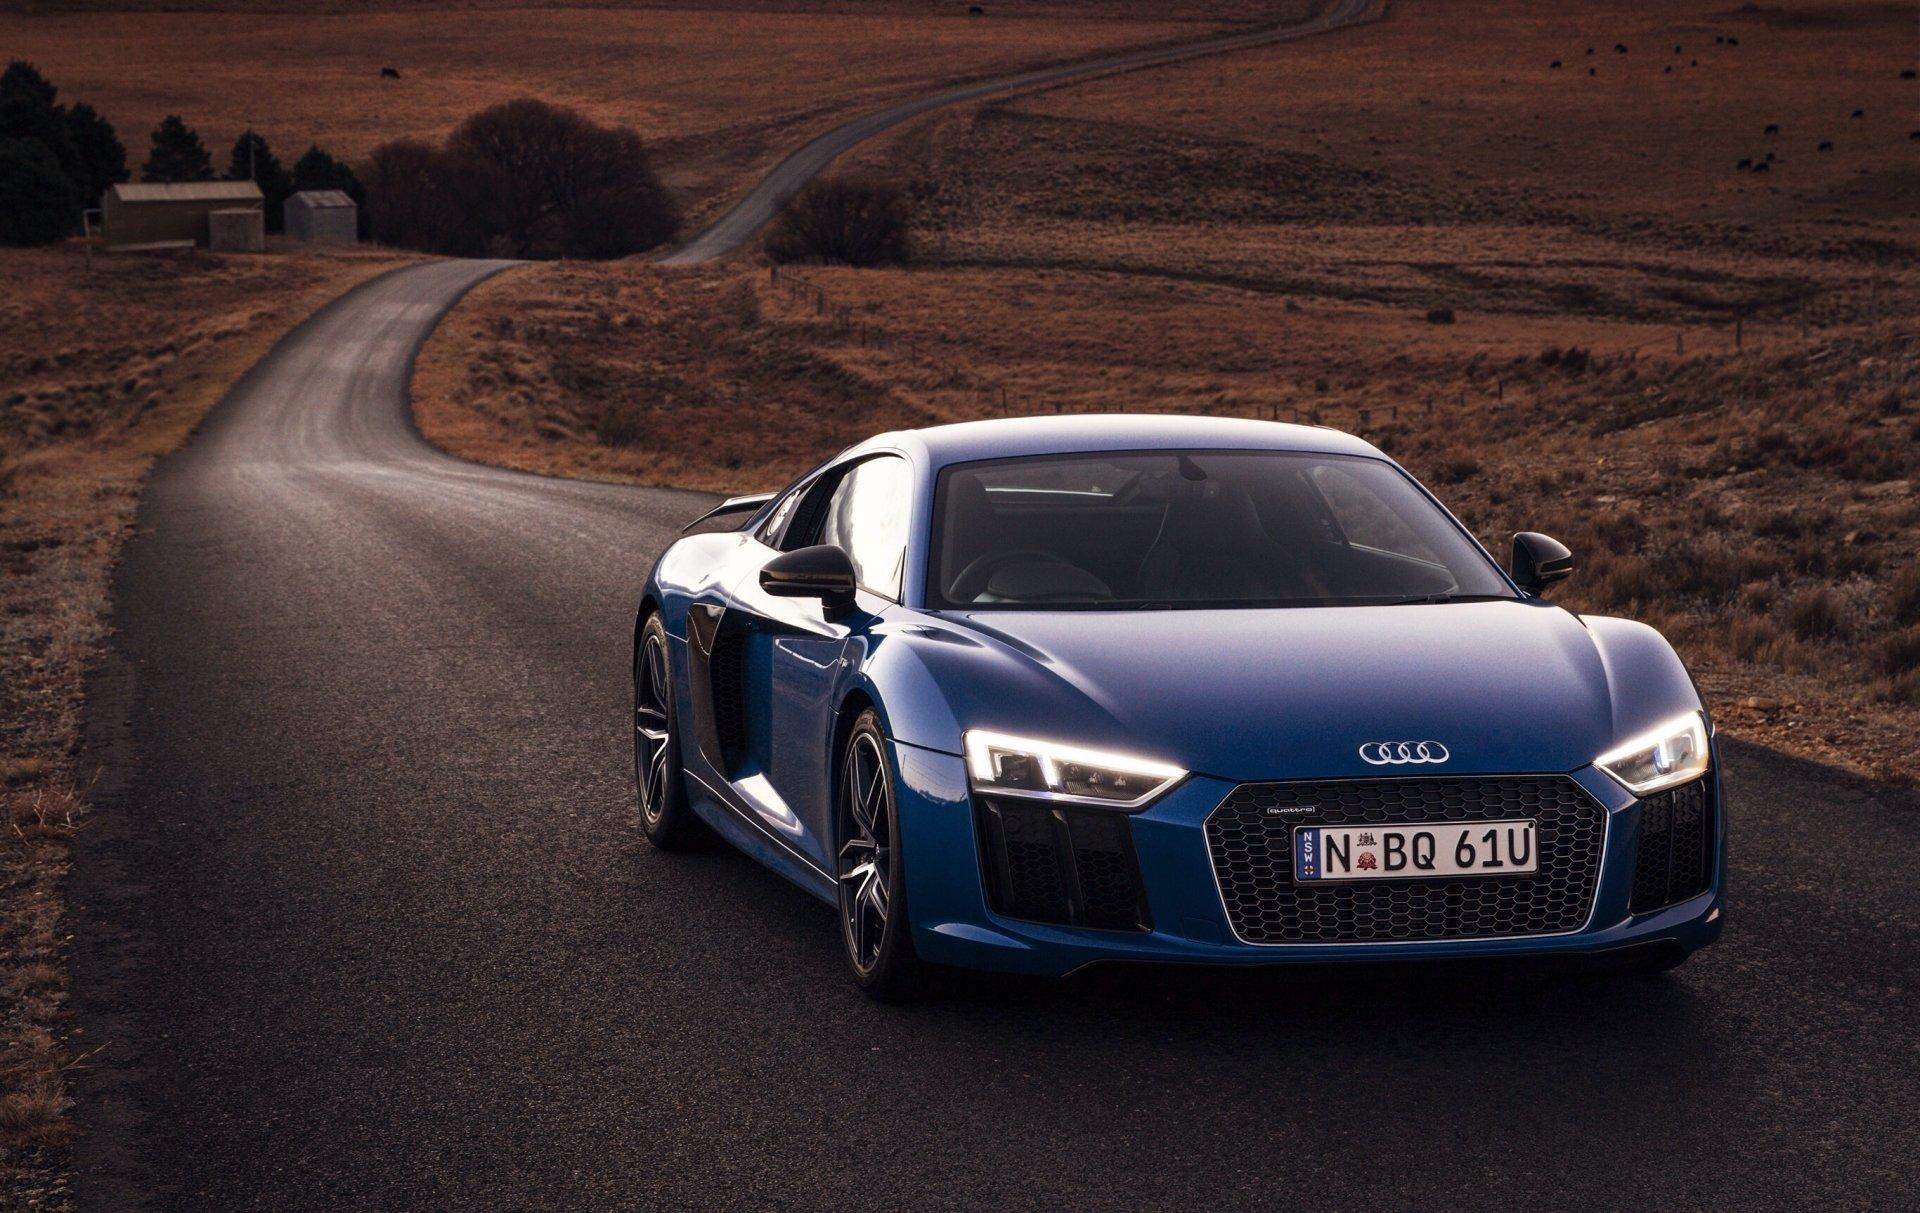 Vehicles - Audi R8  Audi R8 V10 Audi Supercar Blue Car Sport Car Car Vehicle Wallpaper